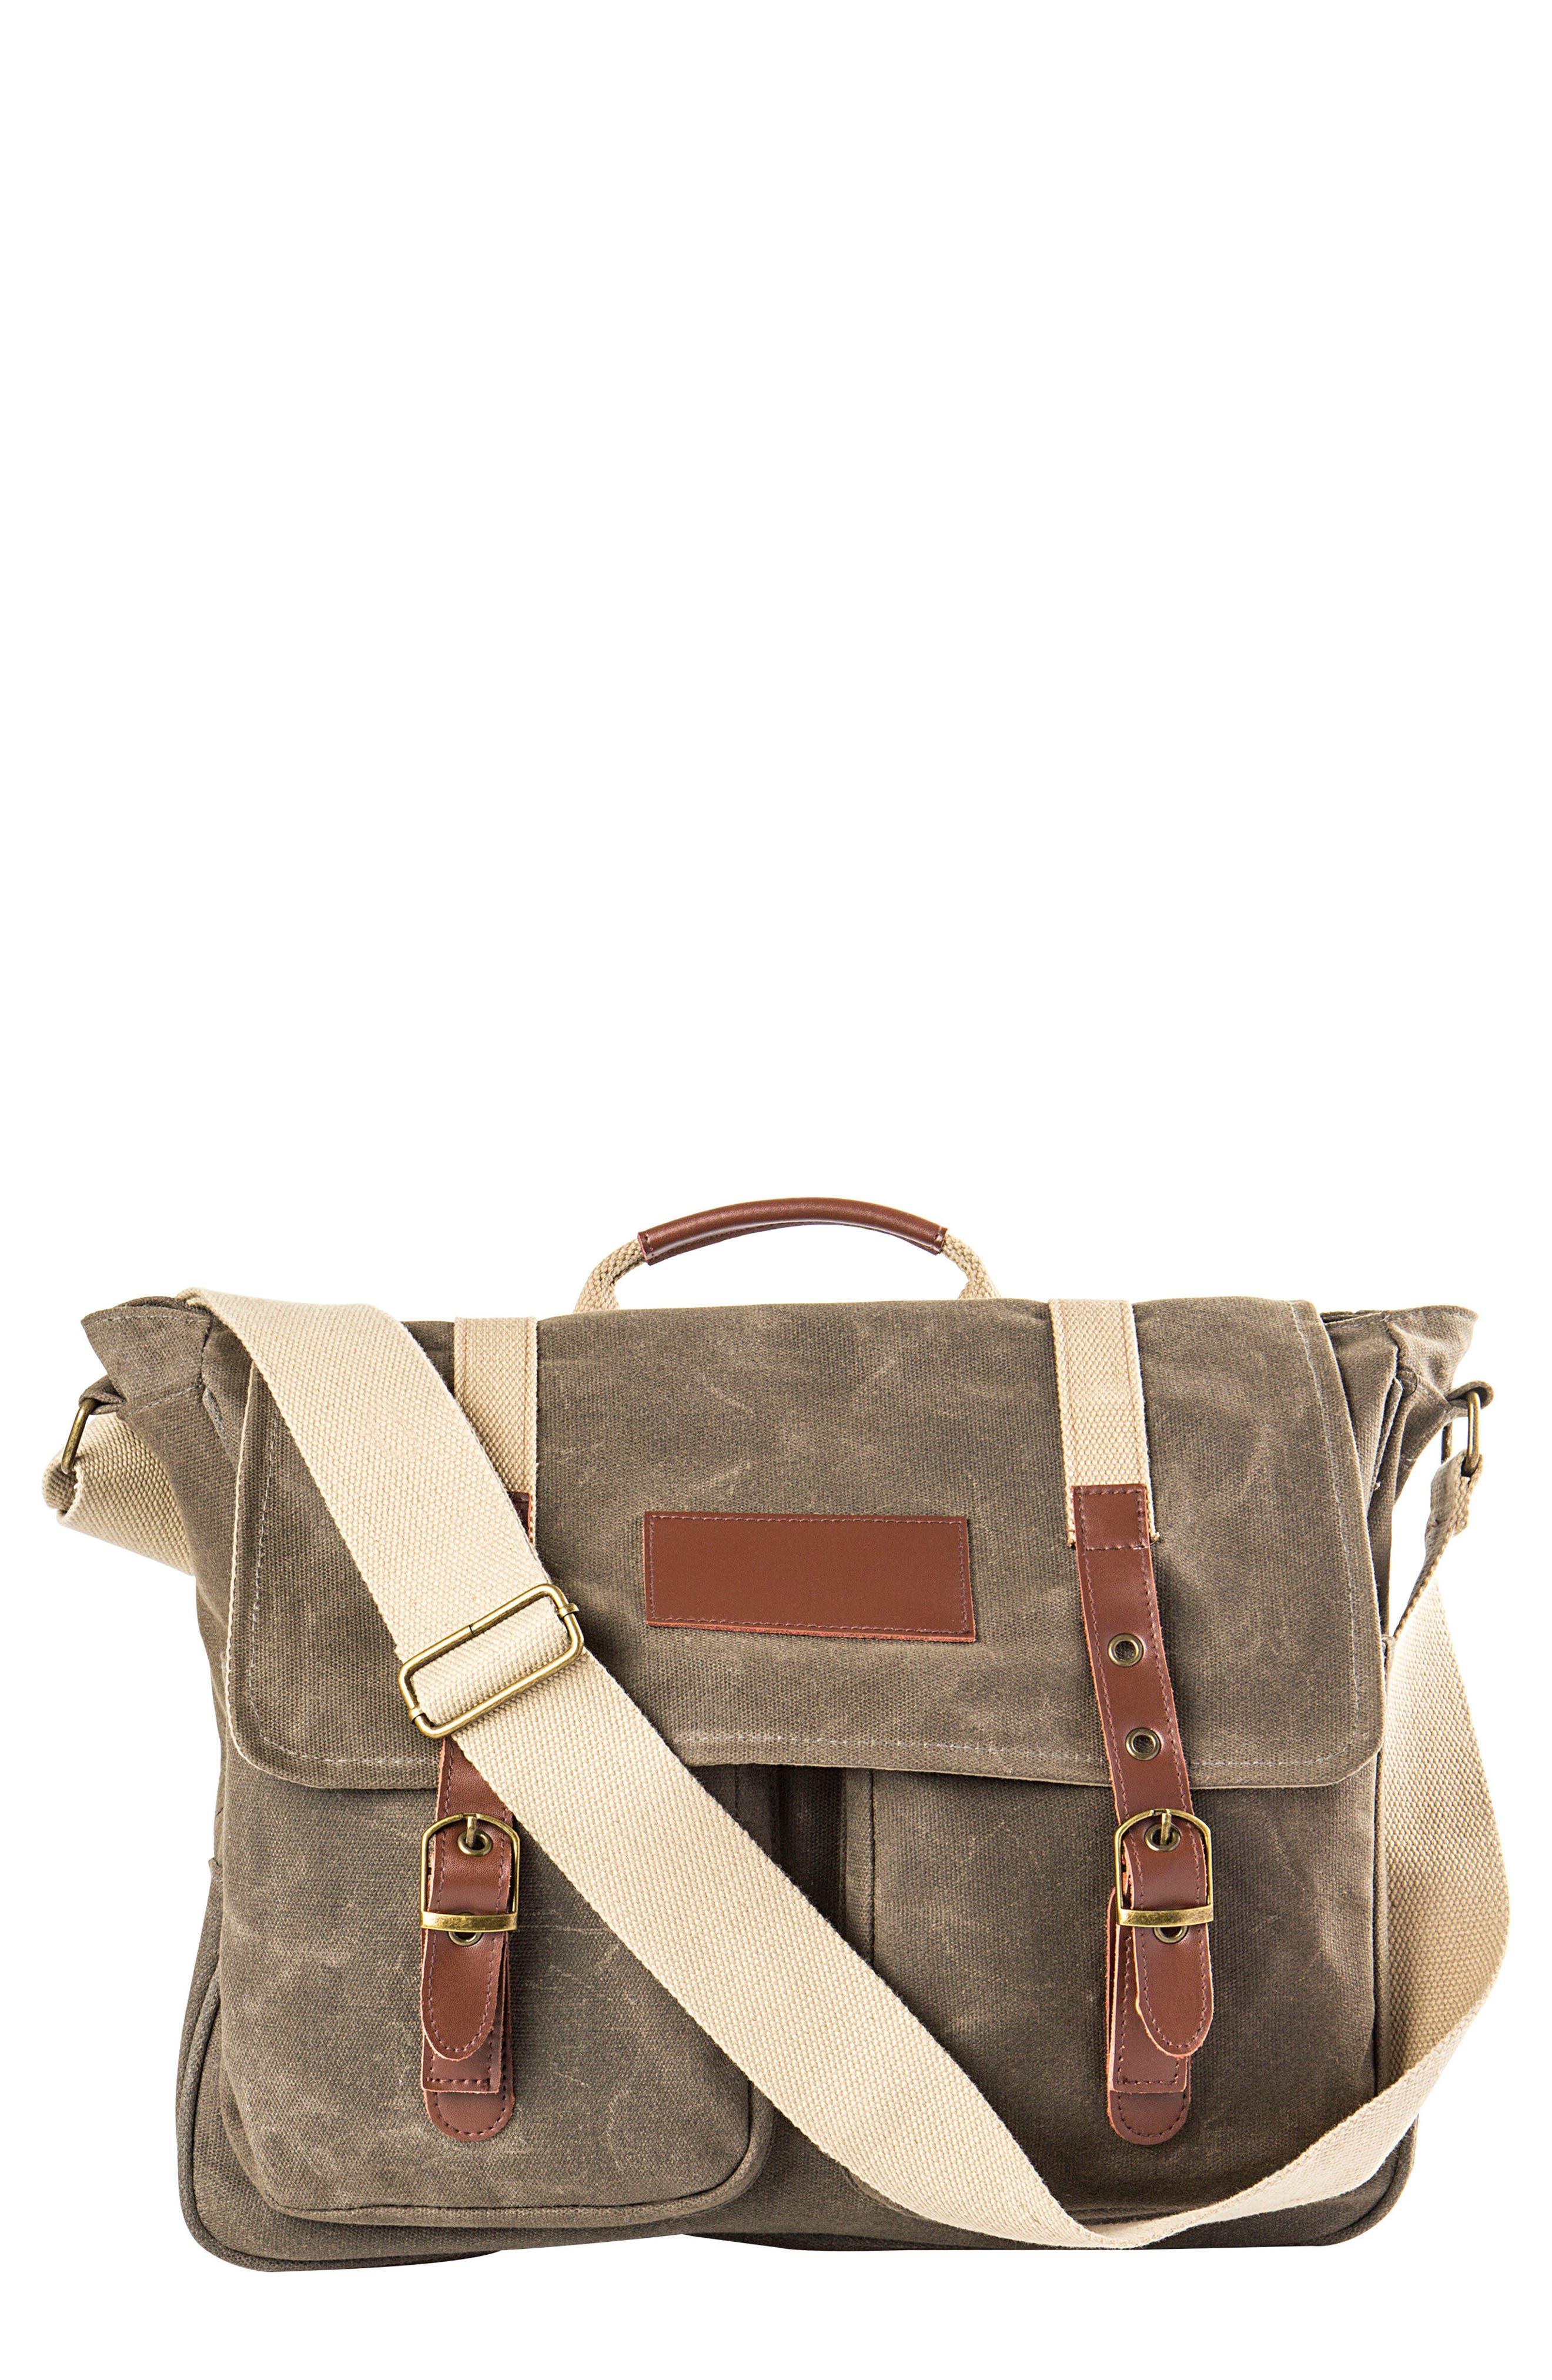 Cathy's Concepts Monogram Messenger Bag